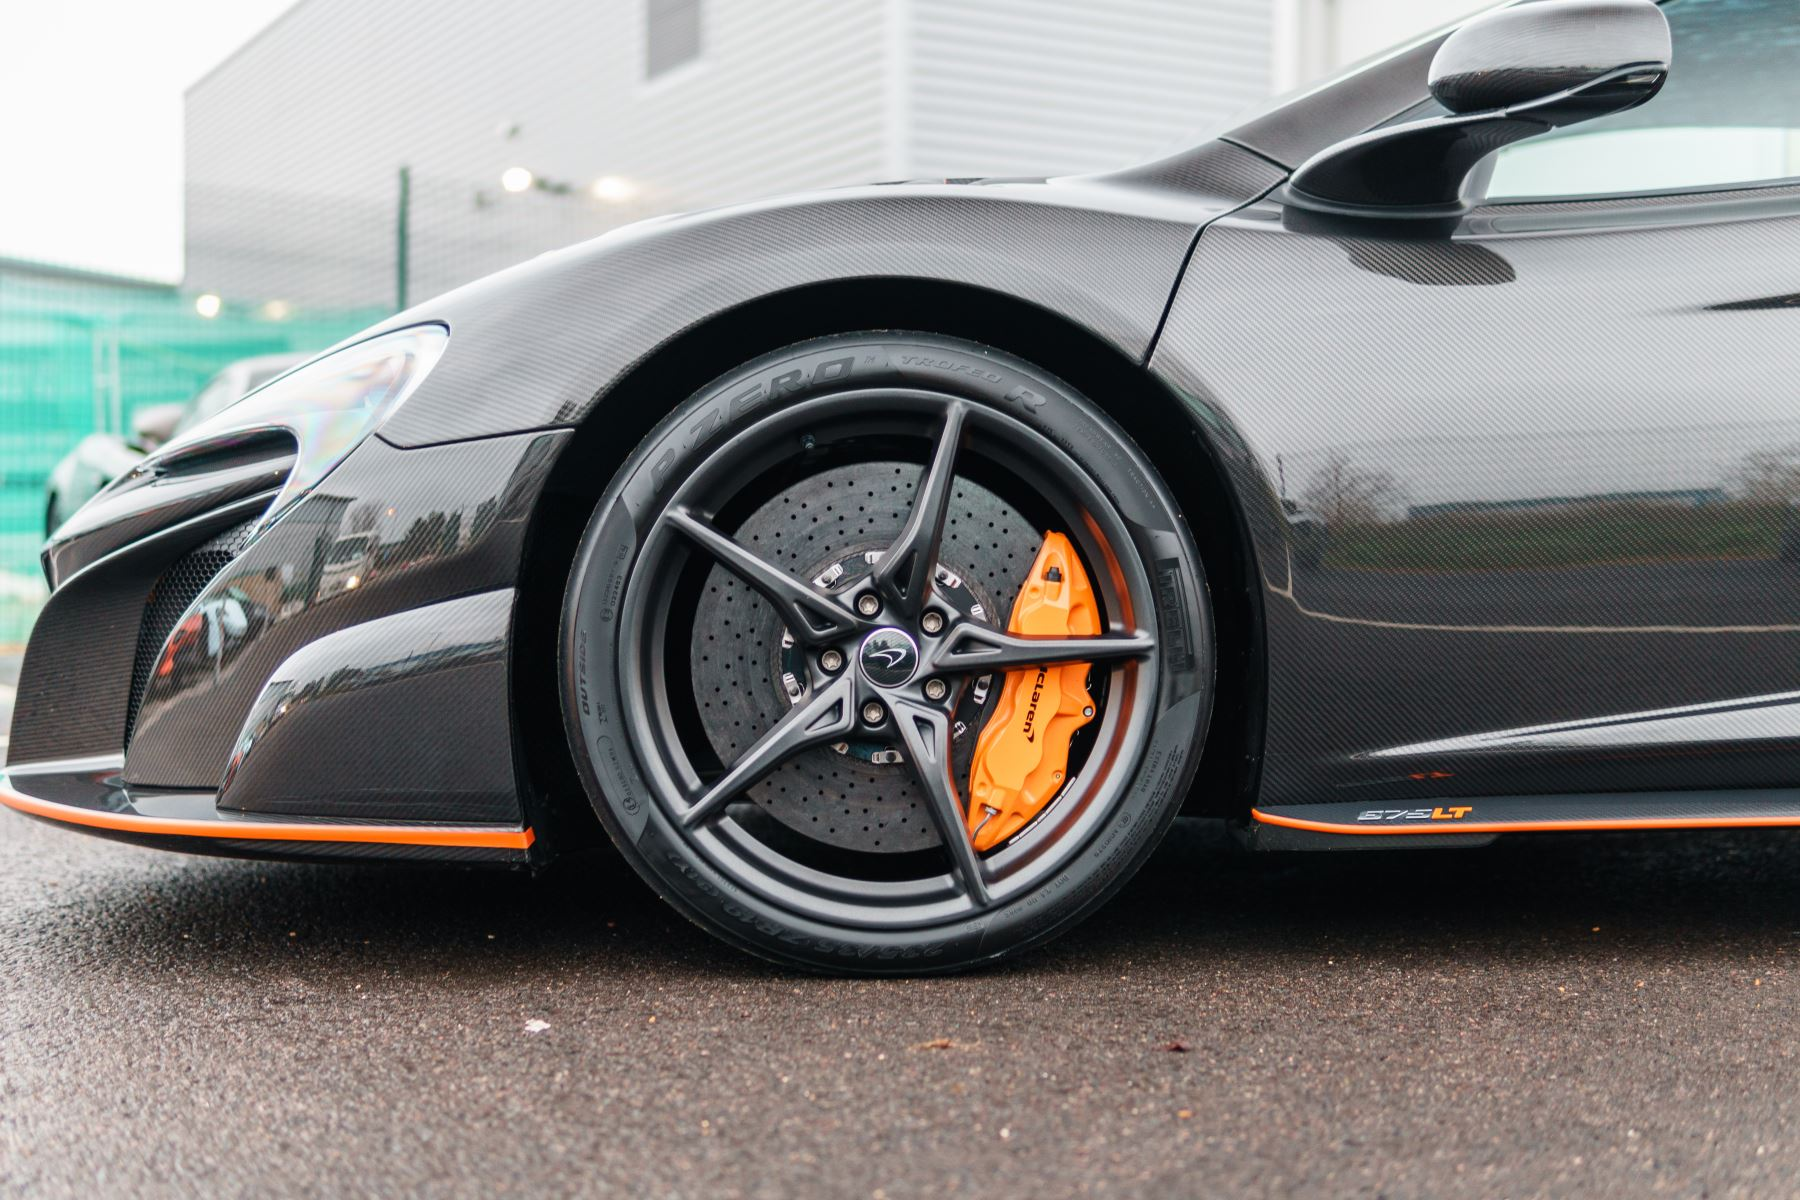 McLaren 675LT Spider MSO Carbon Series image 17